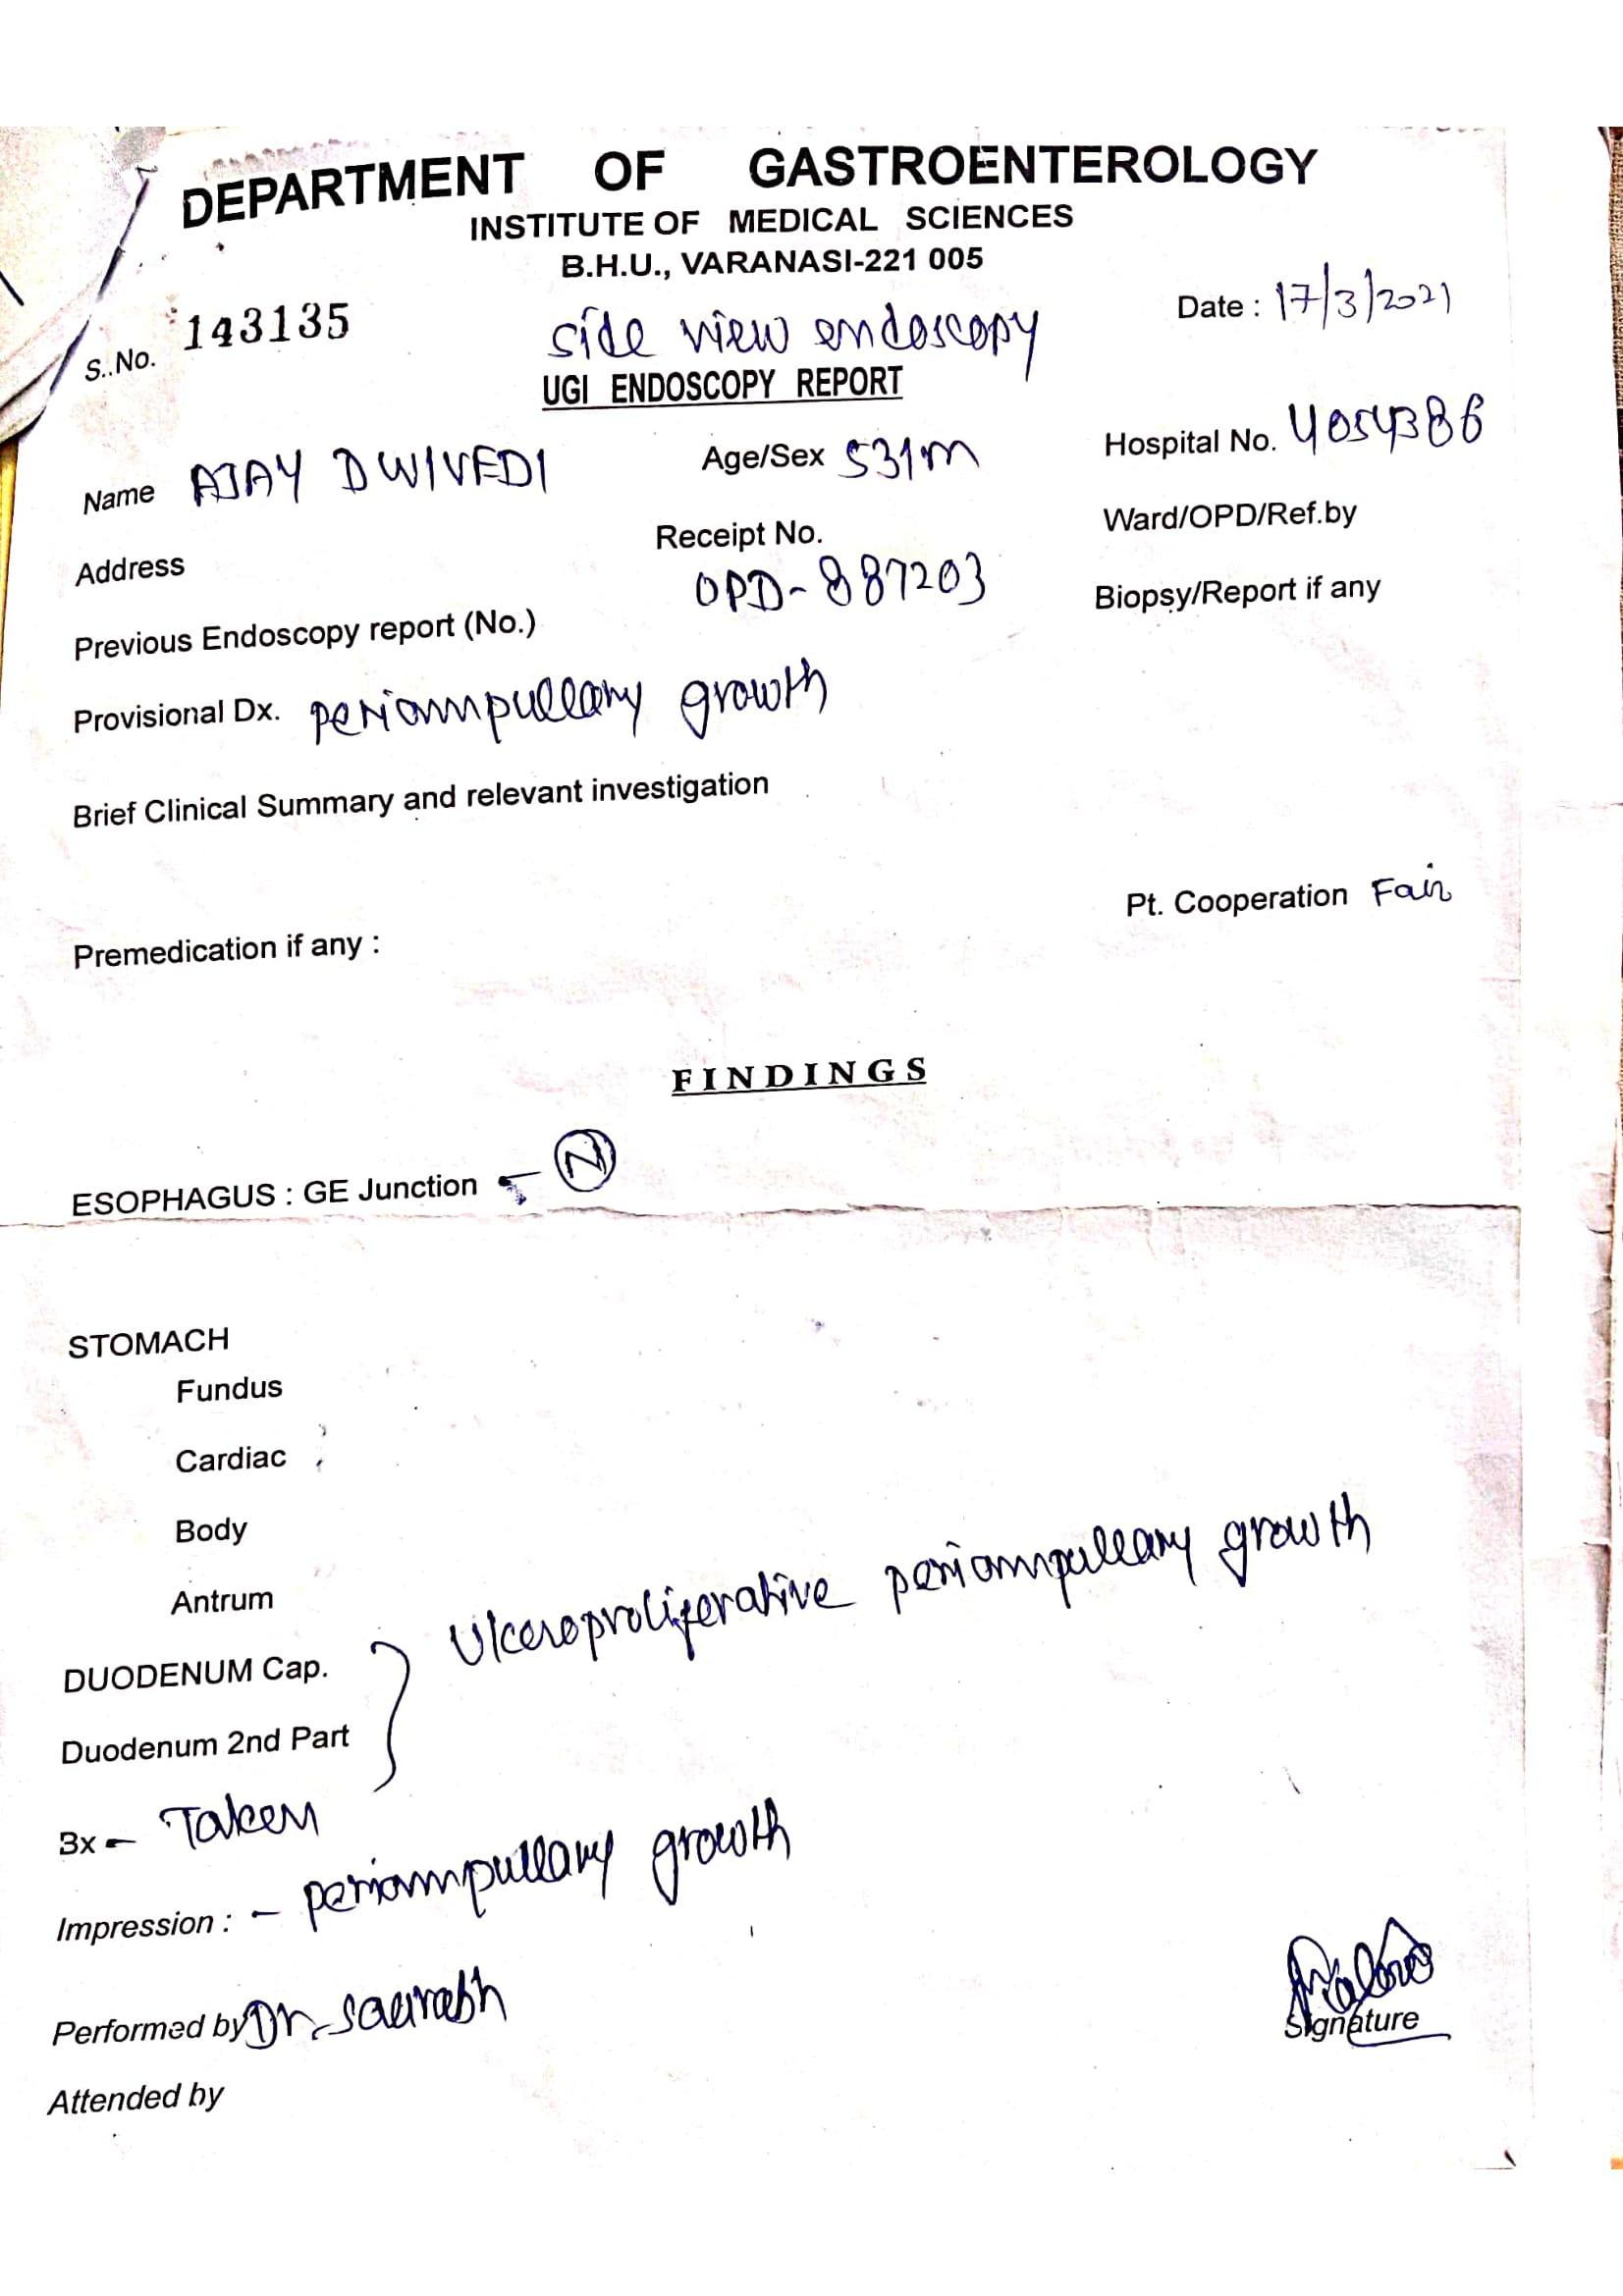 Ajay-Diwedi-Pancreatic-cancer-patient-treatment-024